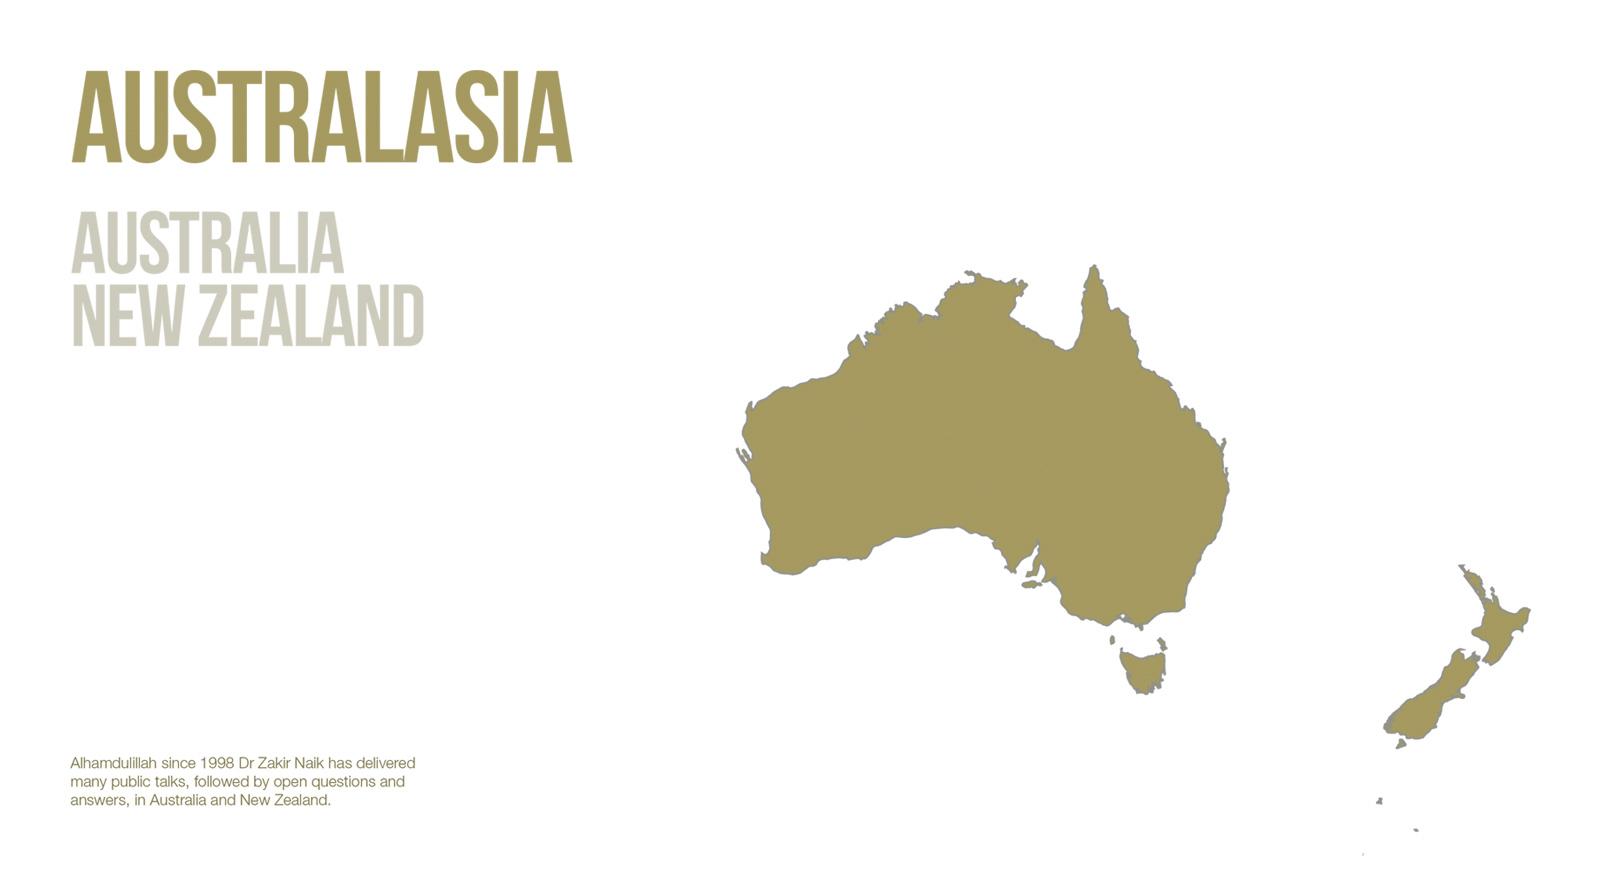 Public Lectures - Australasia